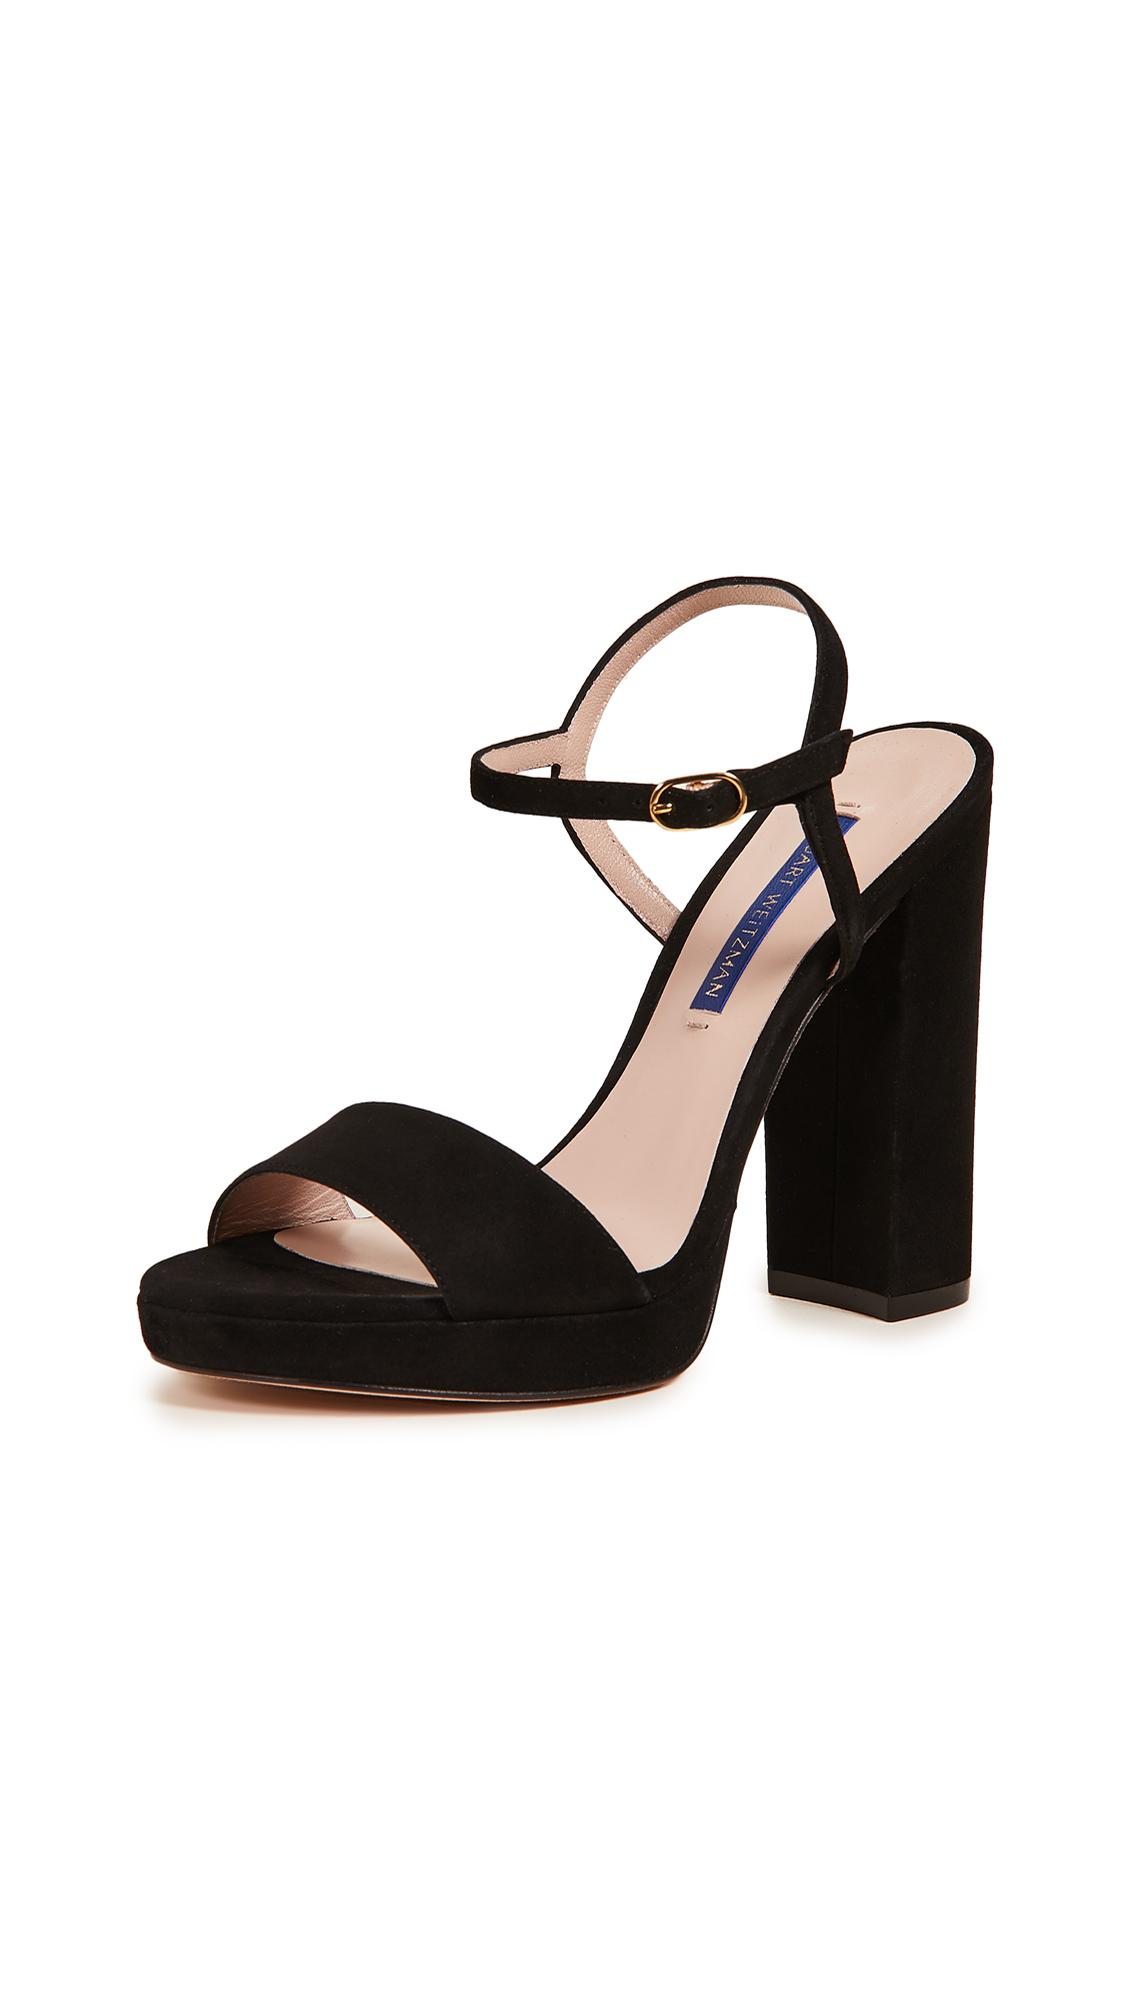 Stuart Weitzman Sunray Platform Sandals - Black